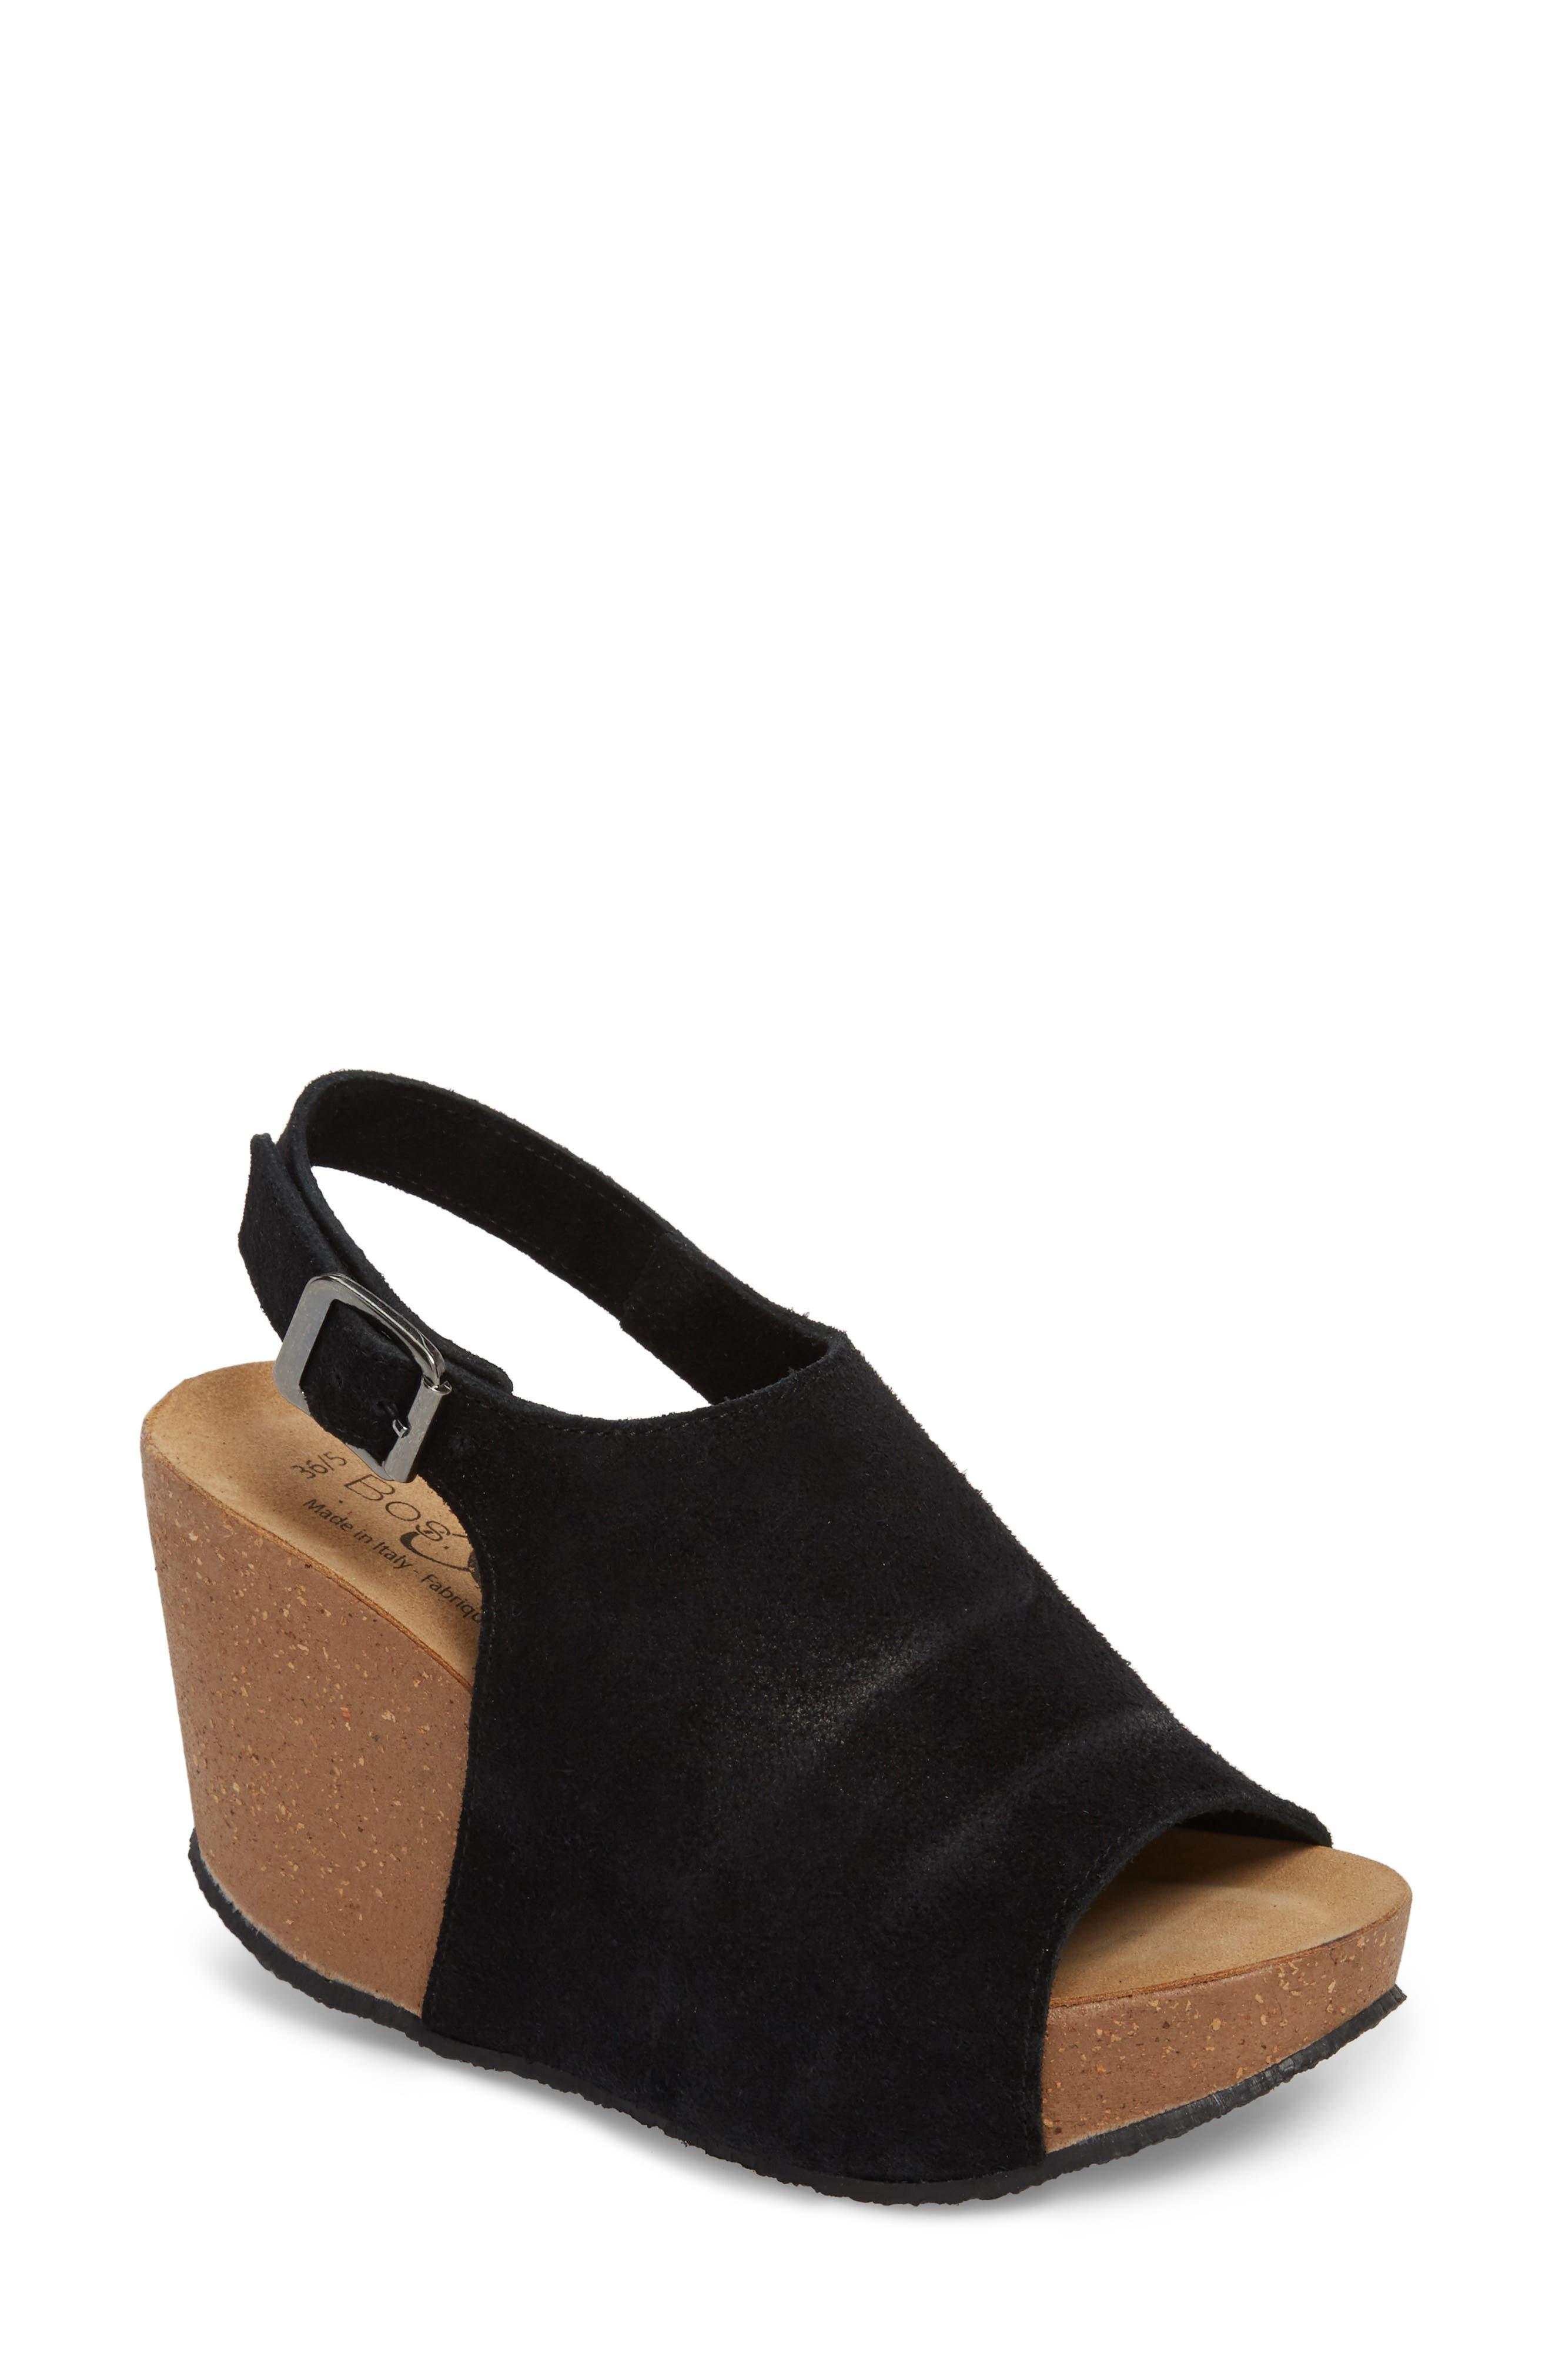 5b4d41dae5aa6 Bos. & Co. Sheila Platform Wedge Sandal - Black